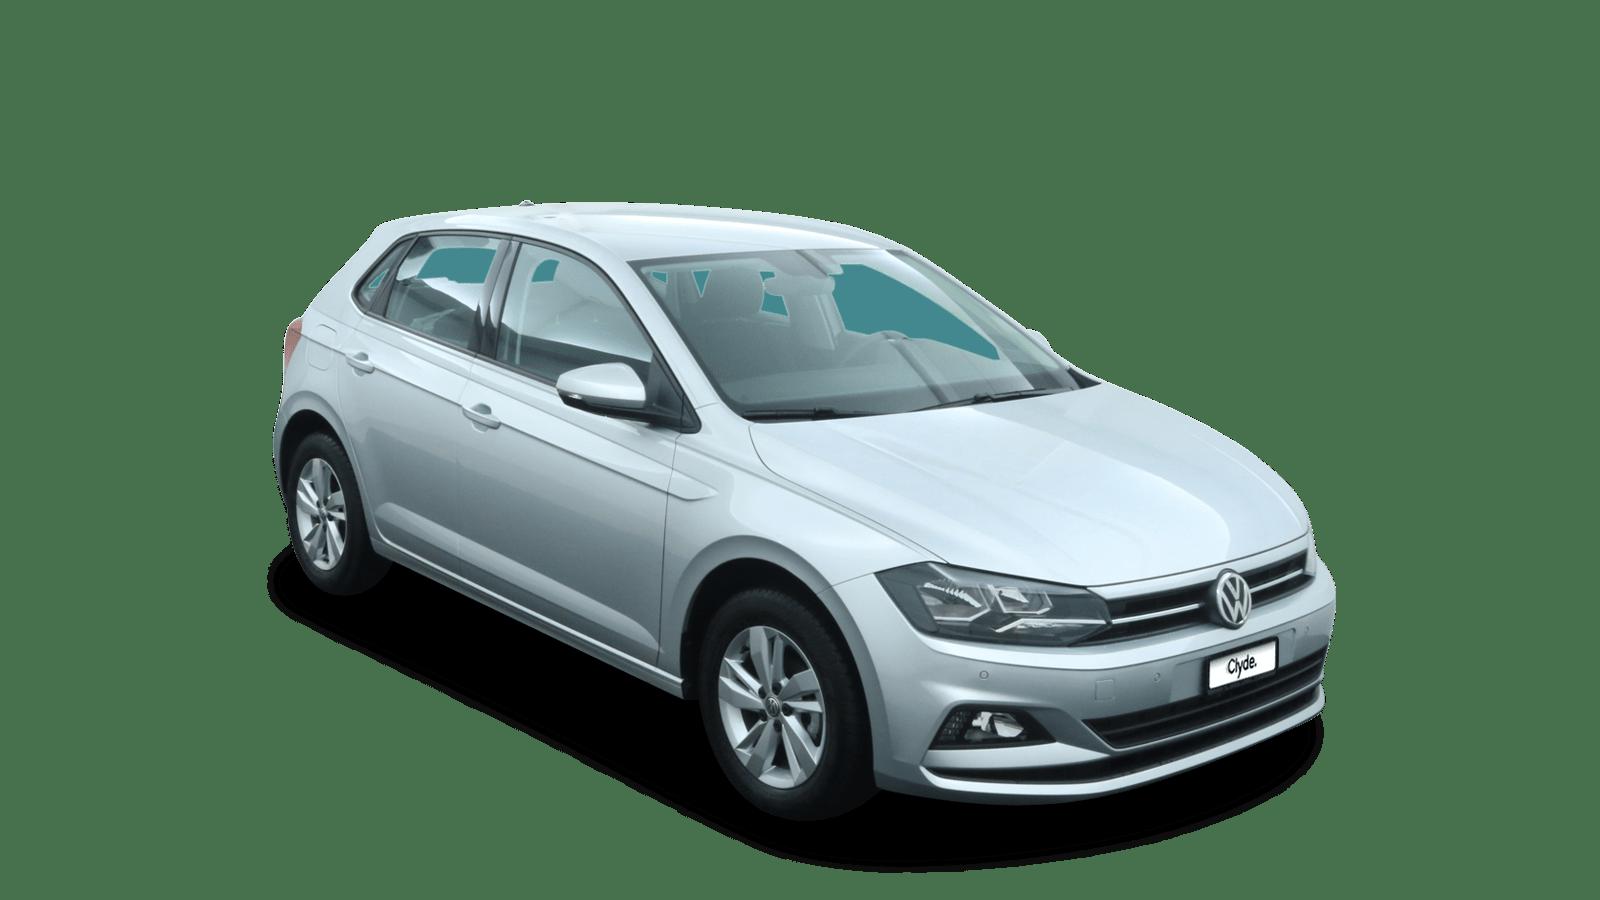 VW Polo Silber front - Clyde Auto-Abo